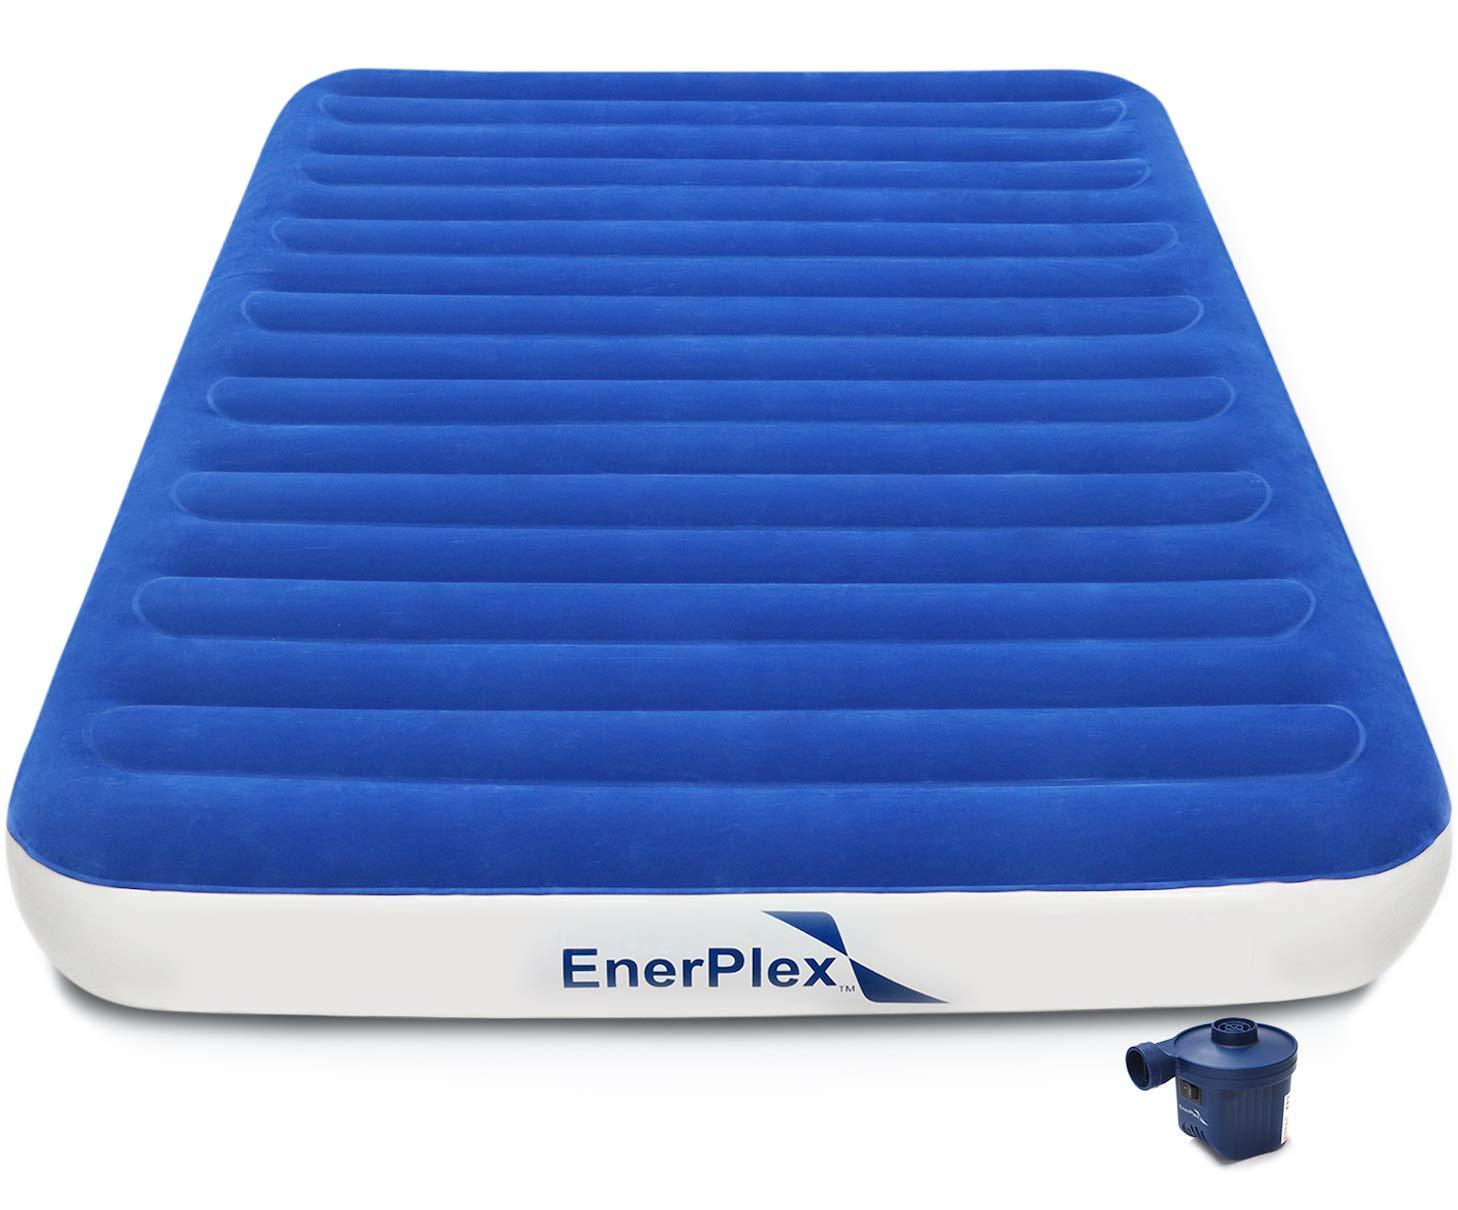 EnerPlex Mattress Wireless Camping Warranty